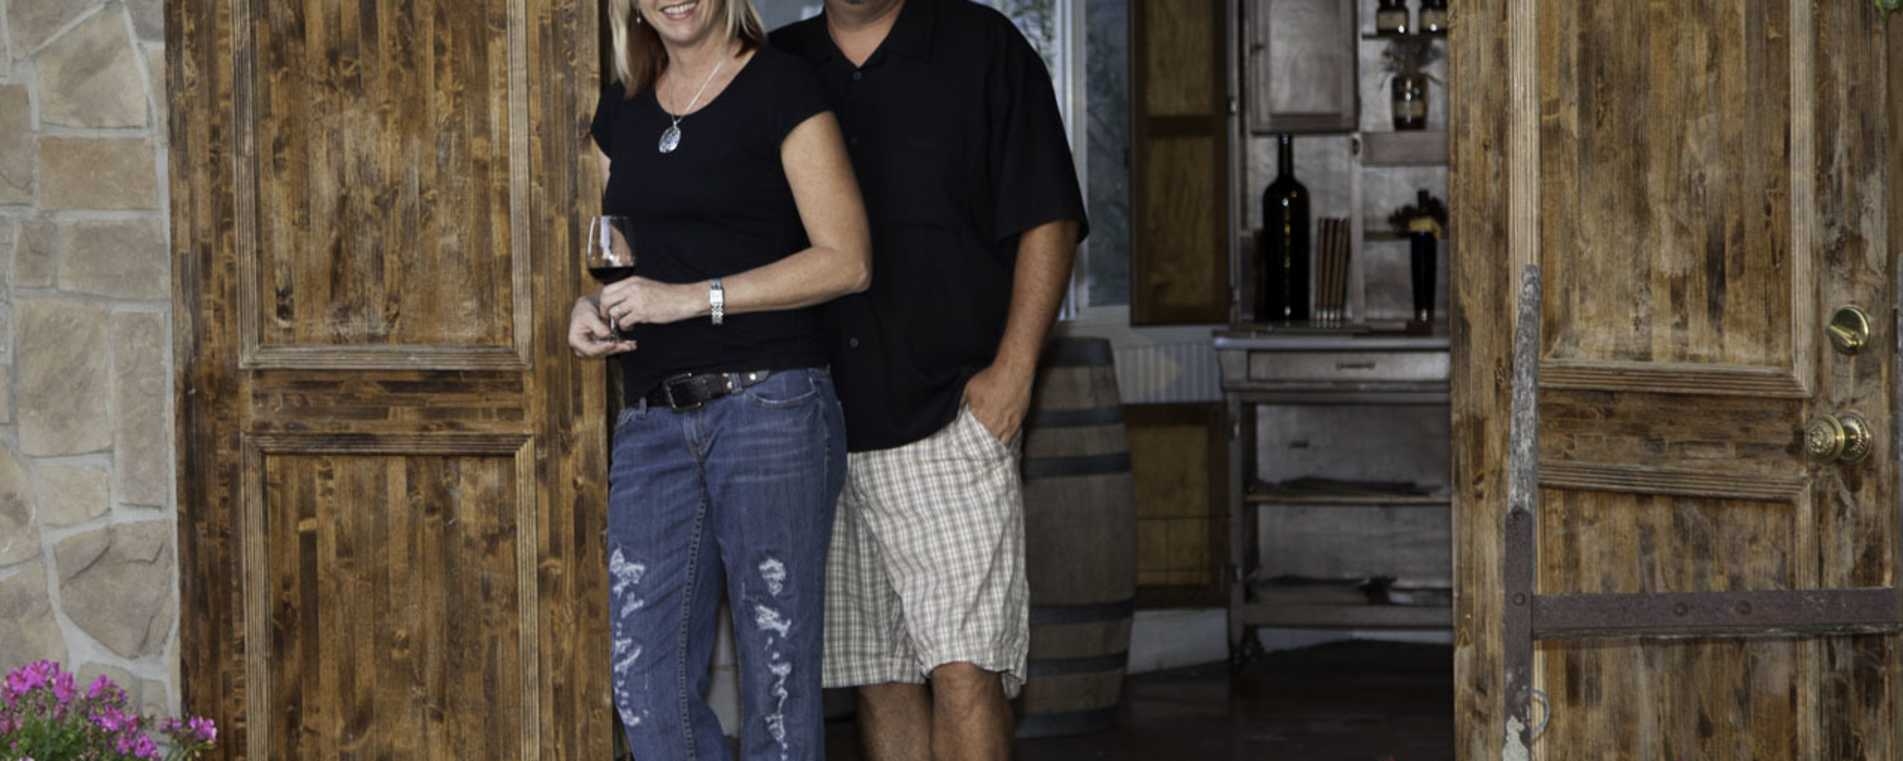 Palumbo Family Vineyard & Winery - Temecula